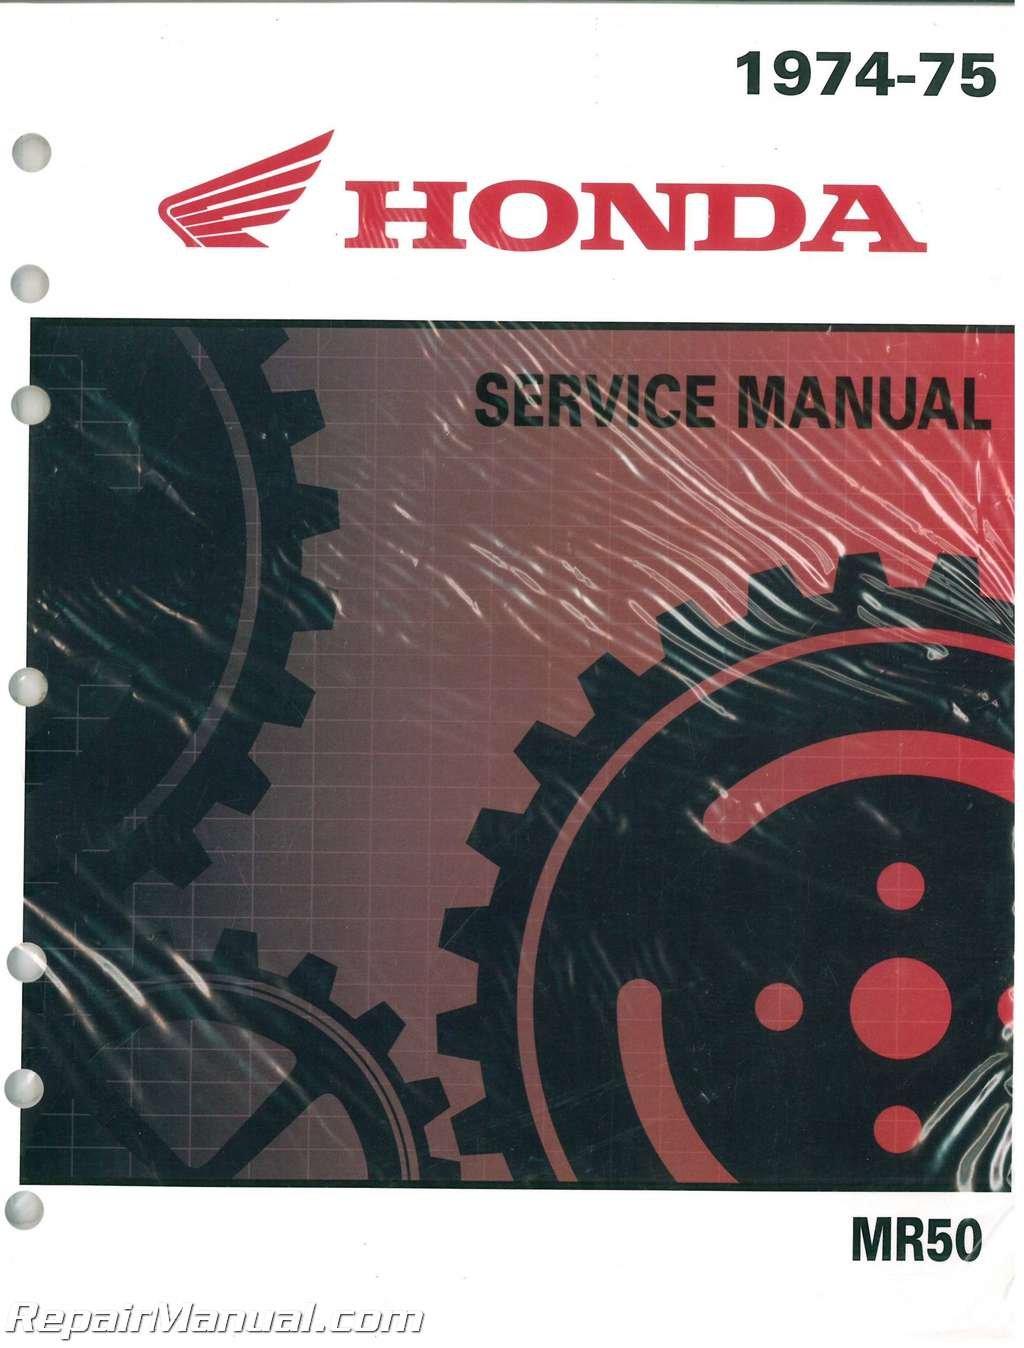 6113101 Honda MR50 Motorcycle Service Manual and Parts Manual 1974 ? 1975:  Manufacturer: Amazon.com: Books